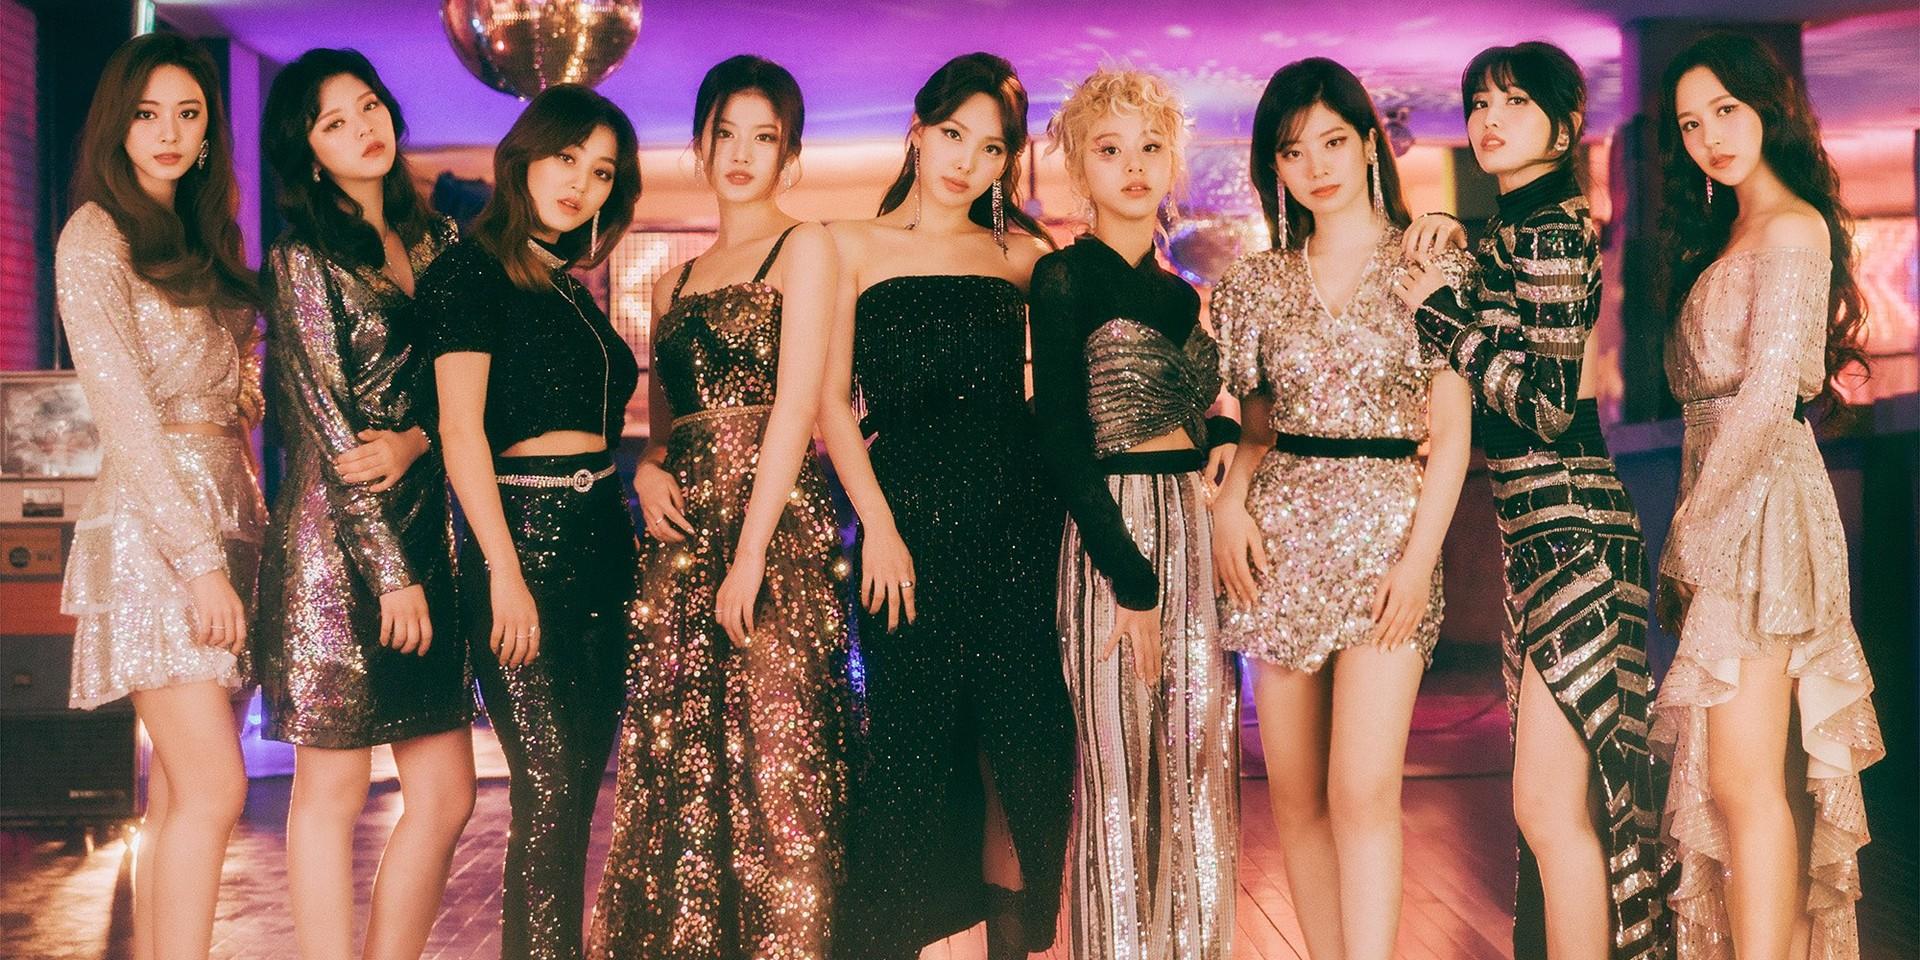 TWICE make a dazzling return with their new Japanese single album 'Kura Kura' — listen